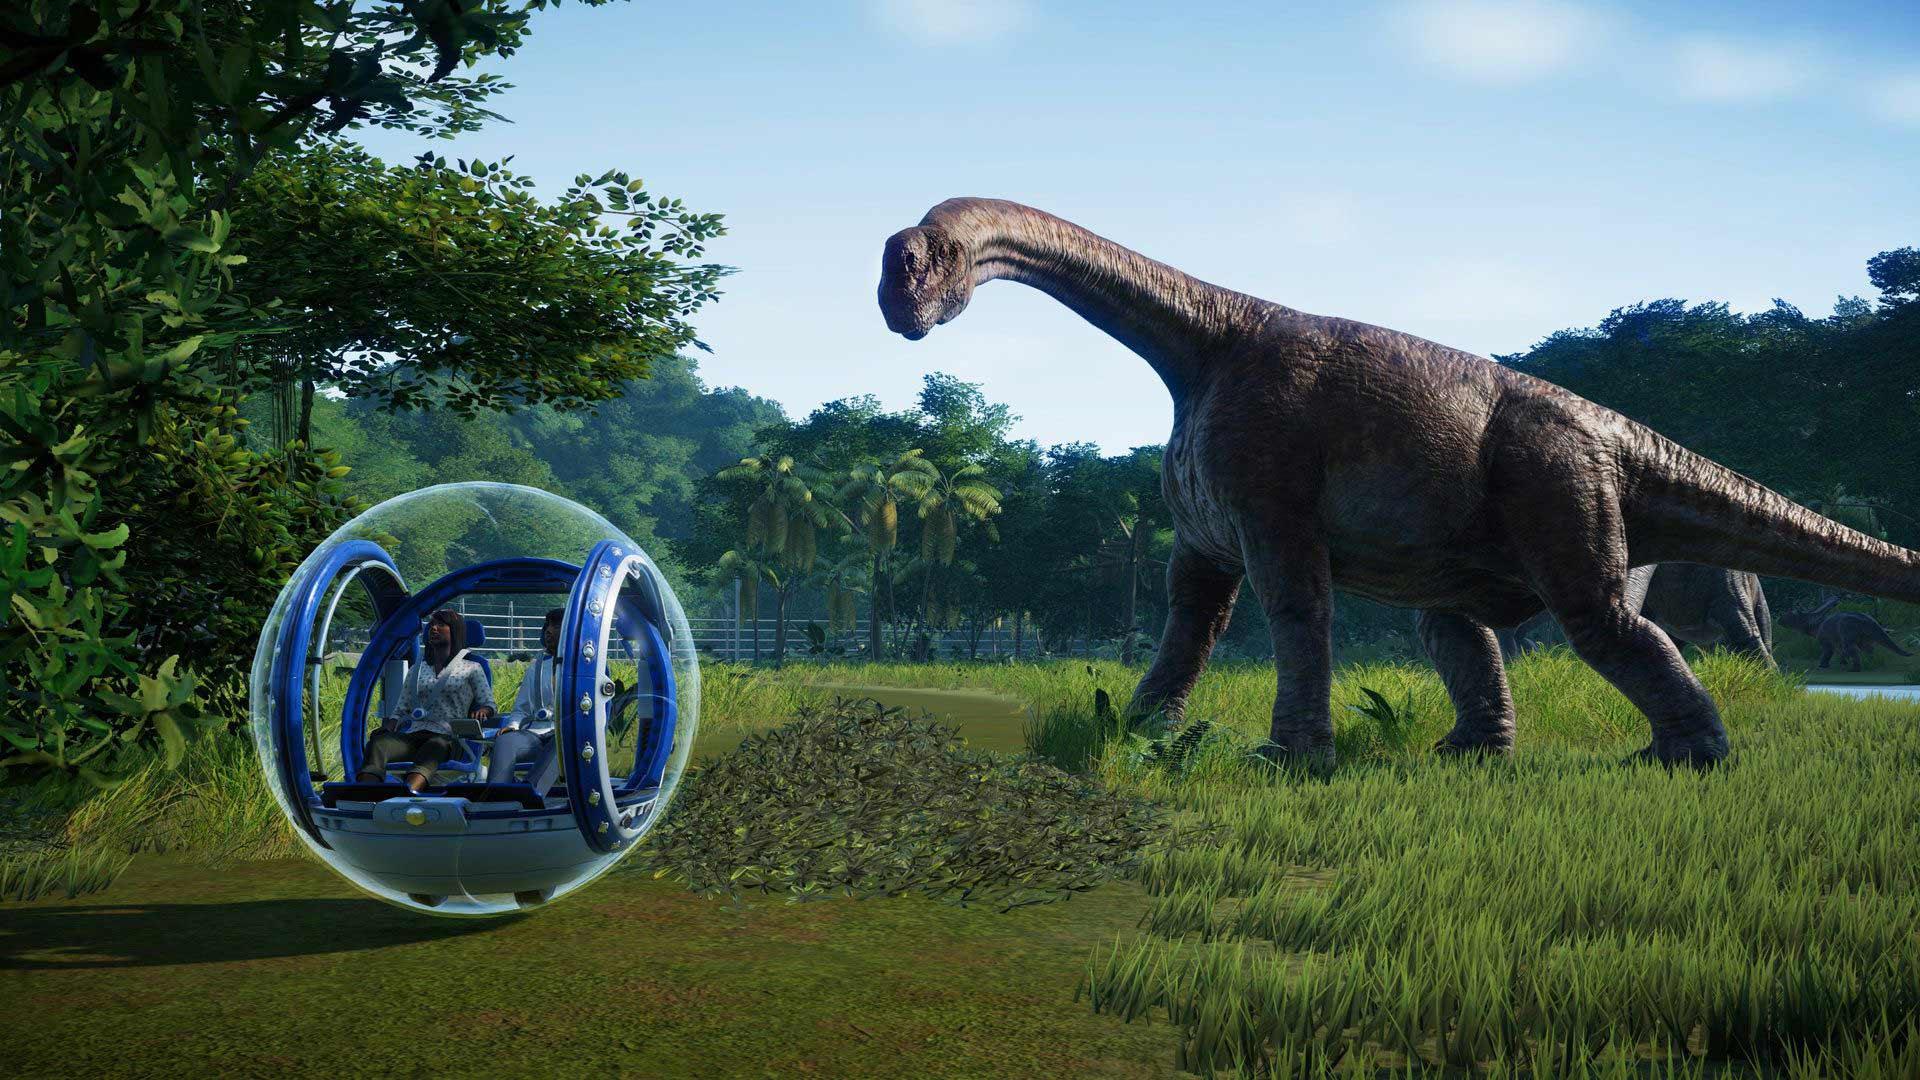 Gyroball Jungle brachiosaurus